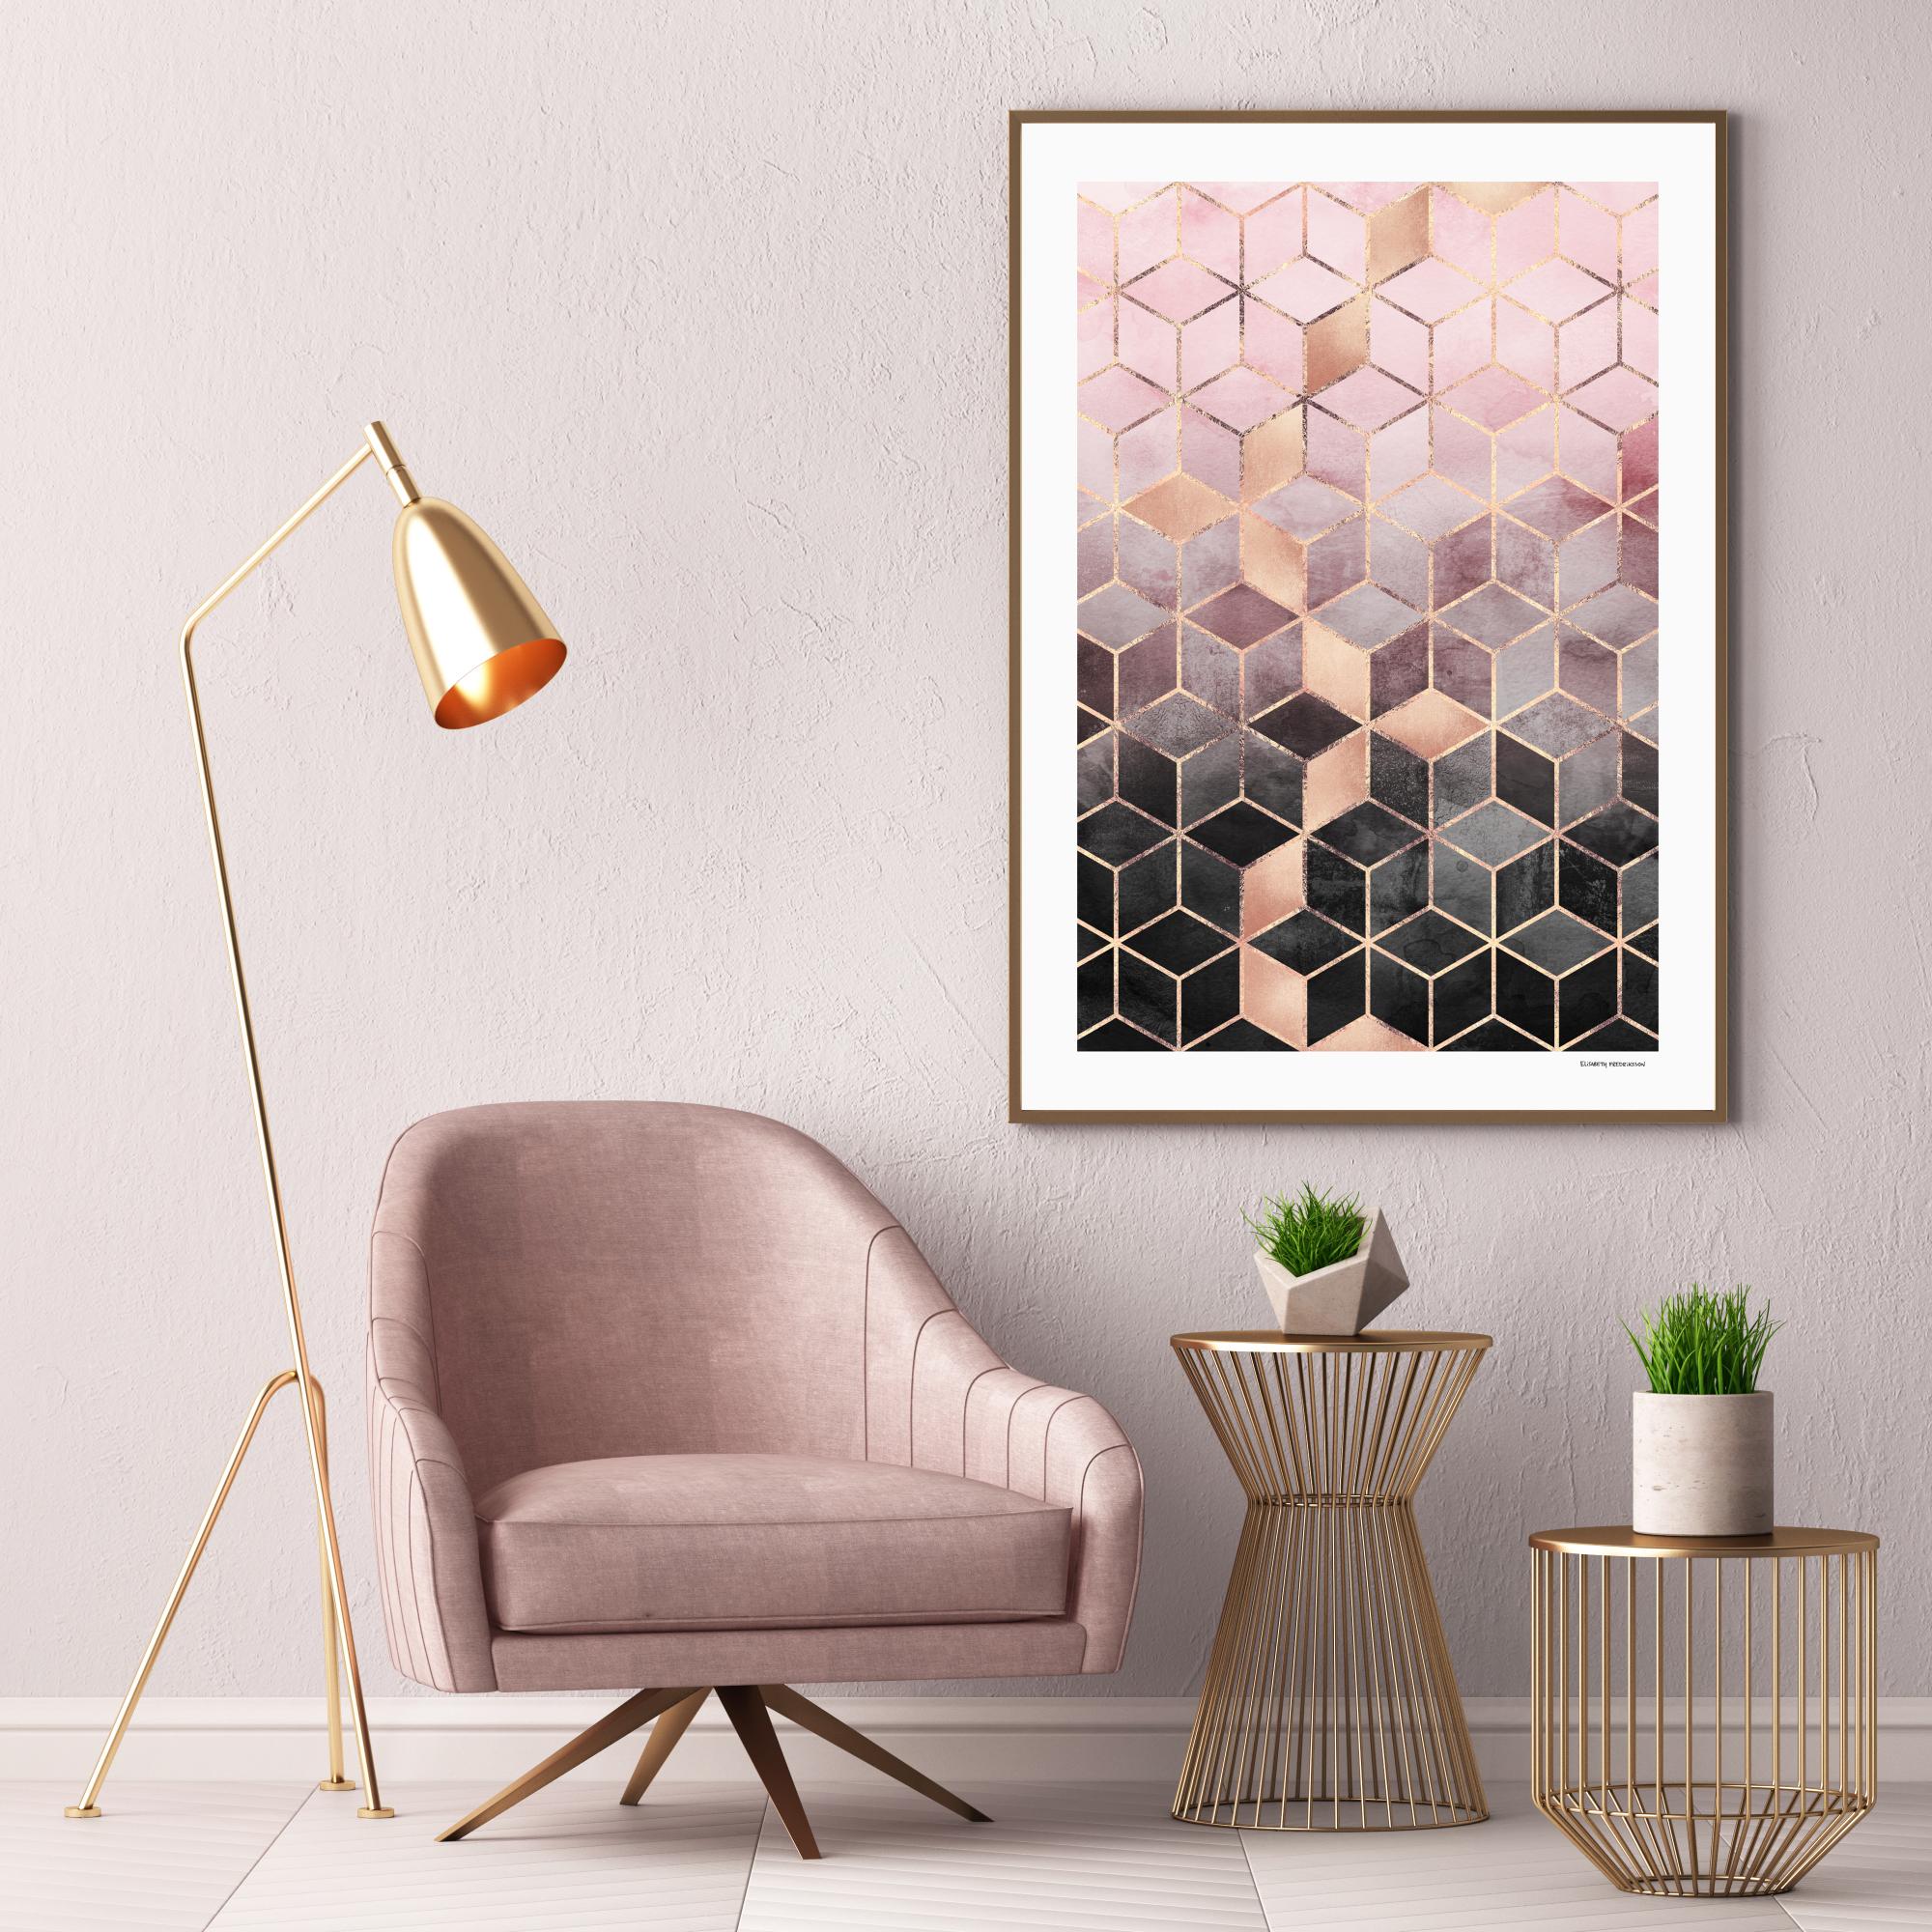 pink_cubes_curioos.jpg